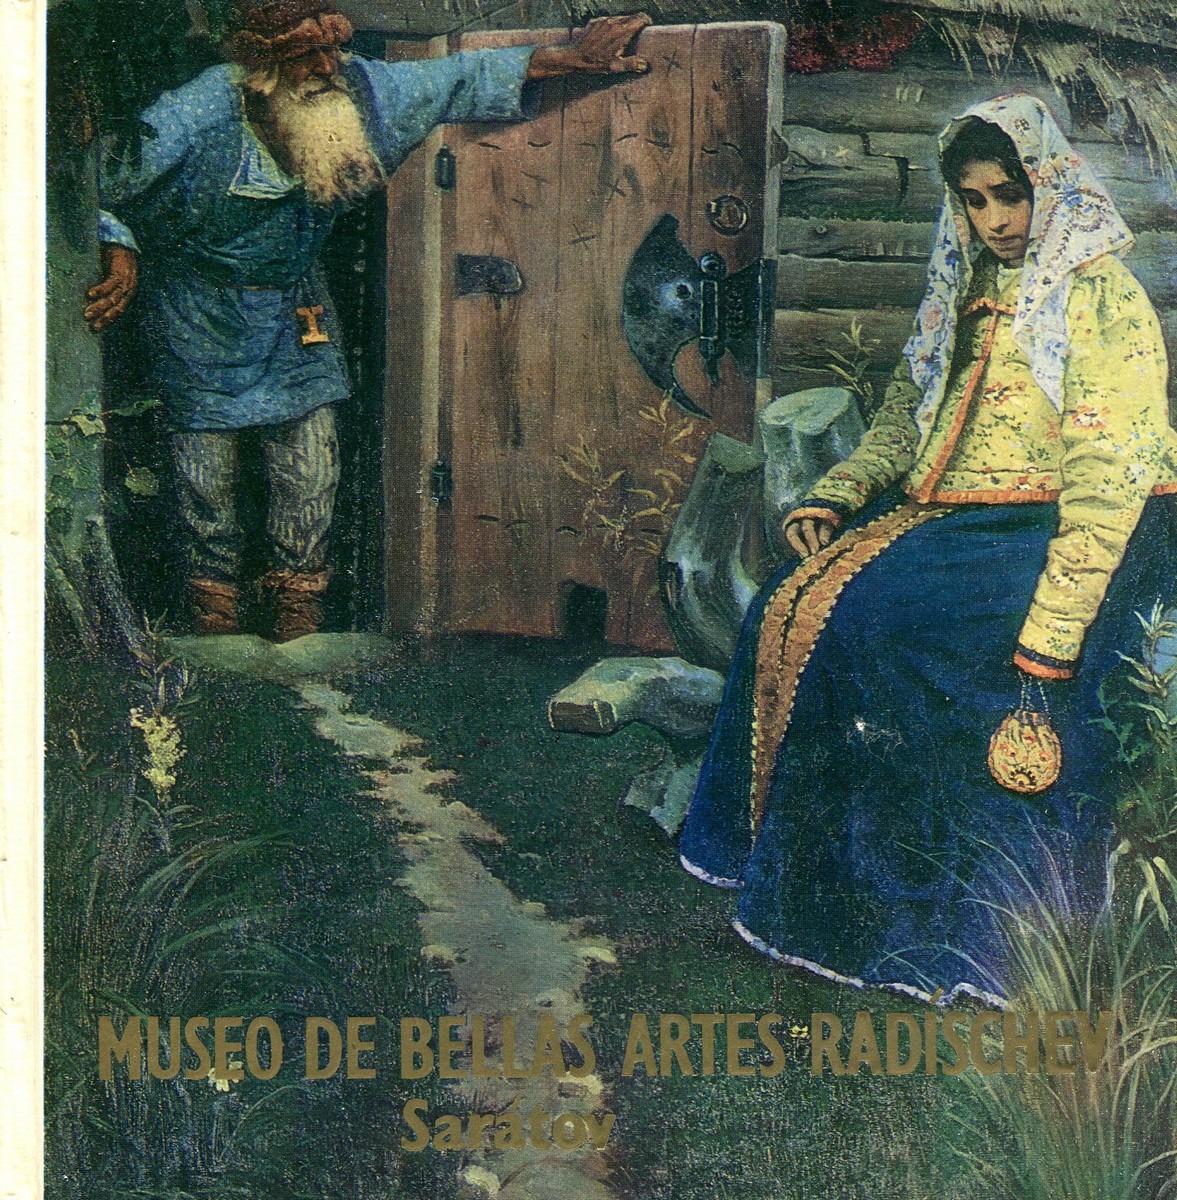 Museo de Bellas Artes Radischev. Saratov коллектив авторов серия maestros de la pintura mundial комплект из 6 книг